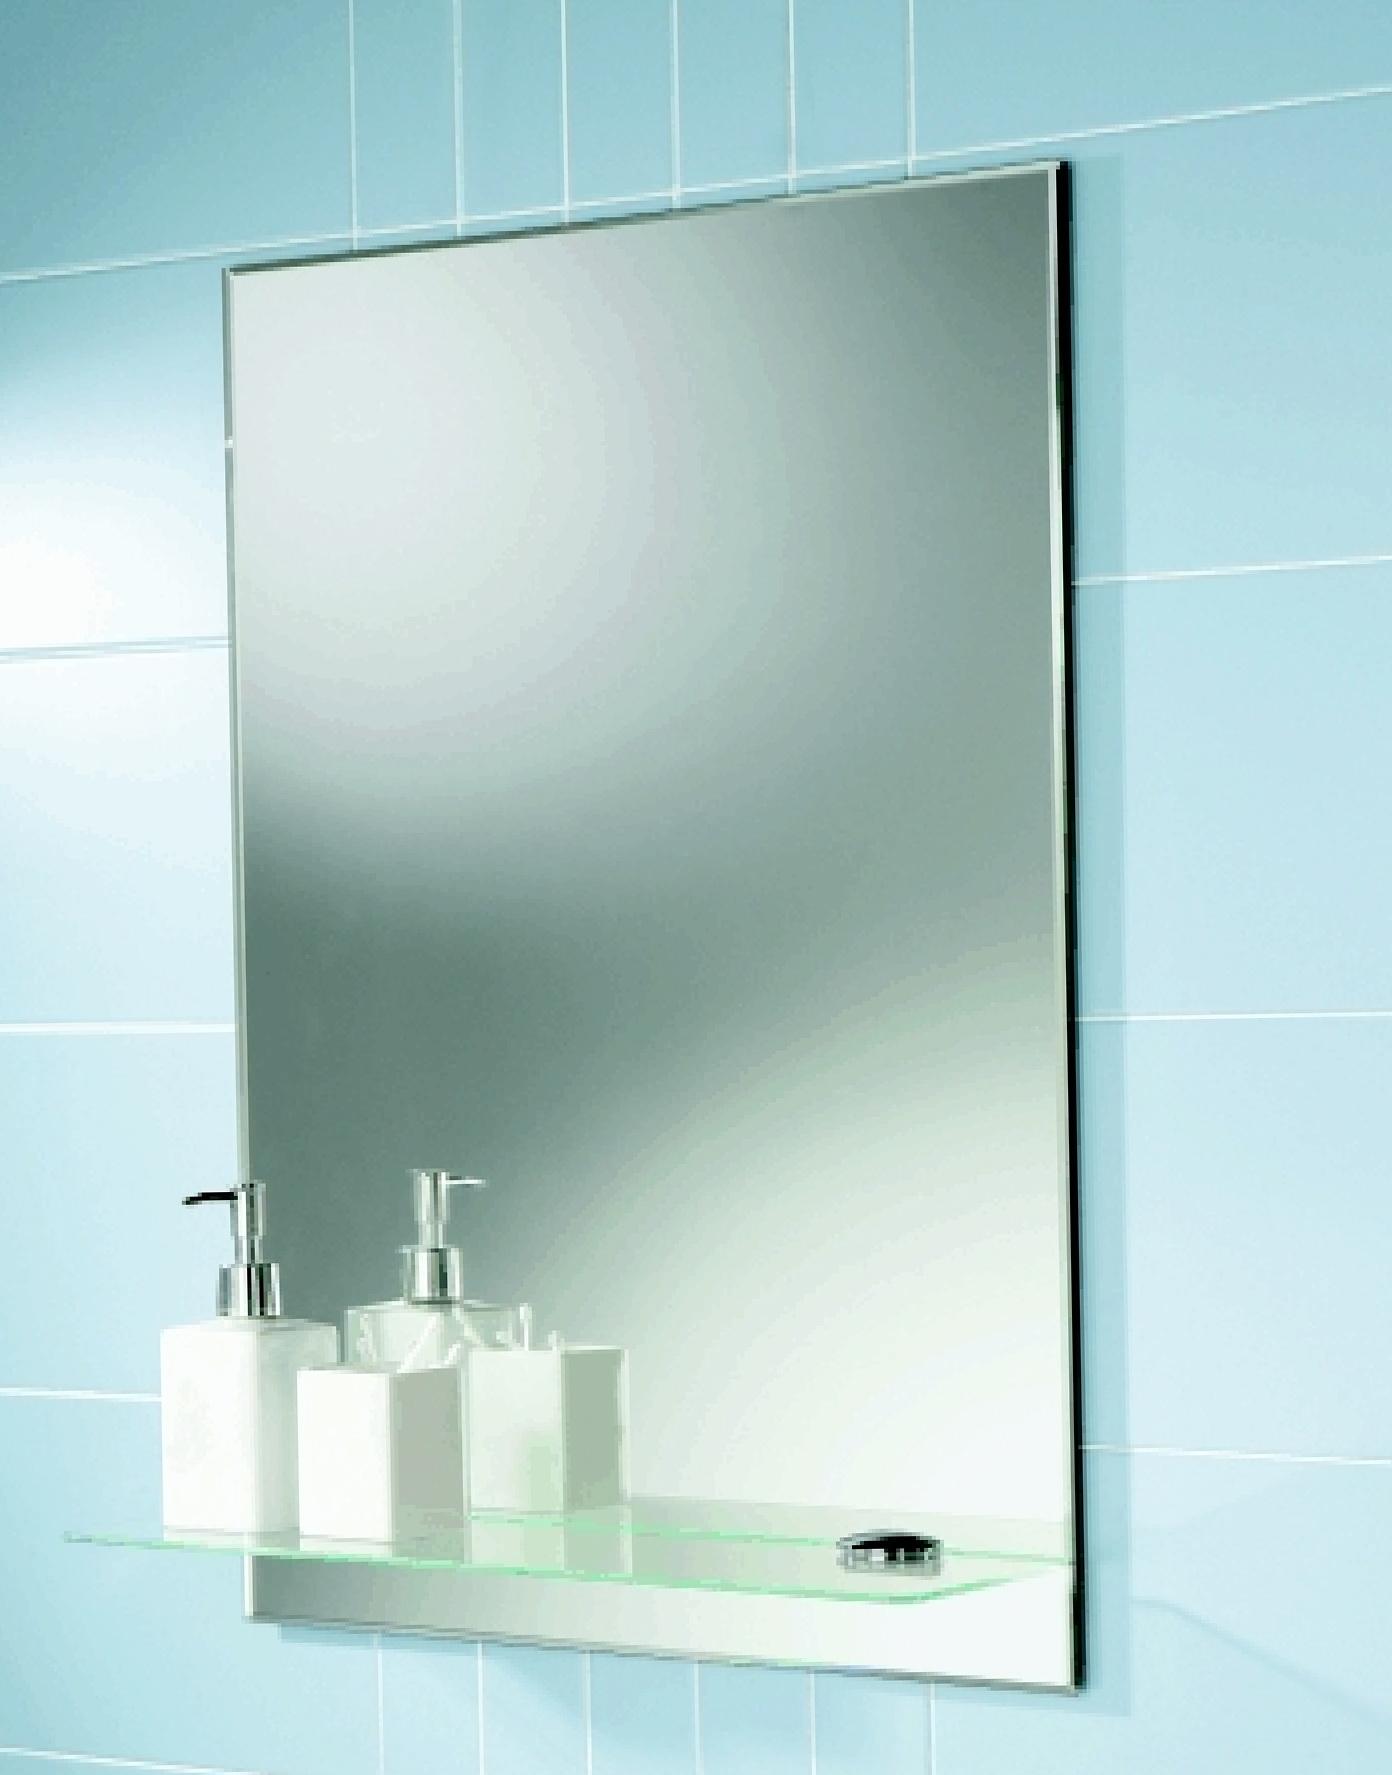 Small Decorative Mirrors For Bathrooms